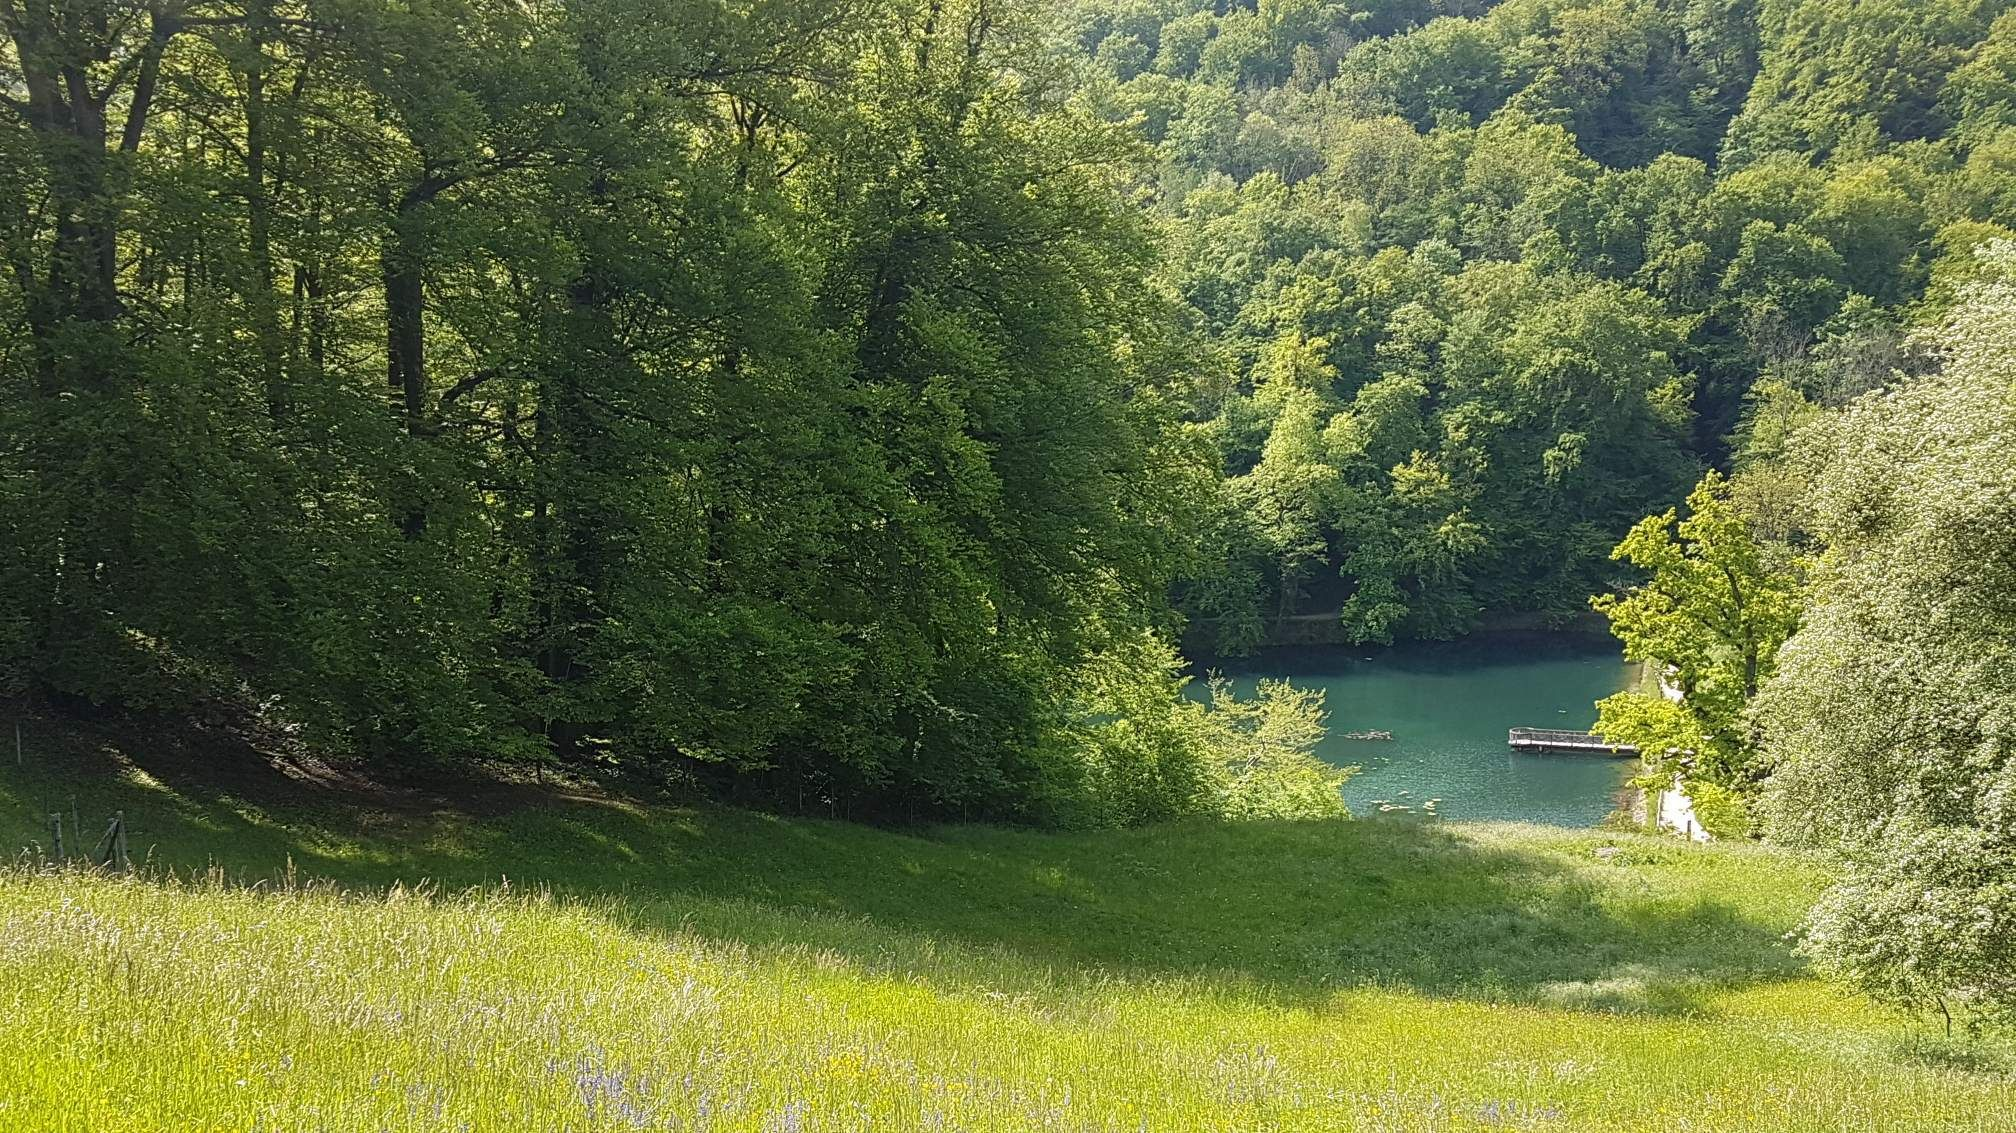 Zug Forest Bathing (Shinrin-yoku)